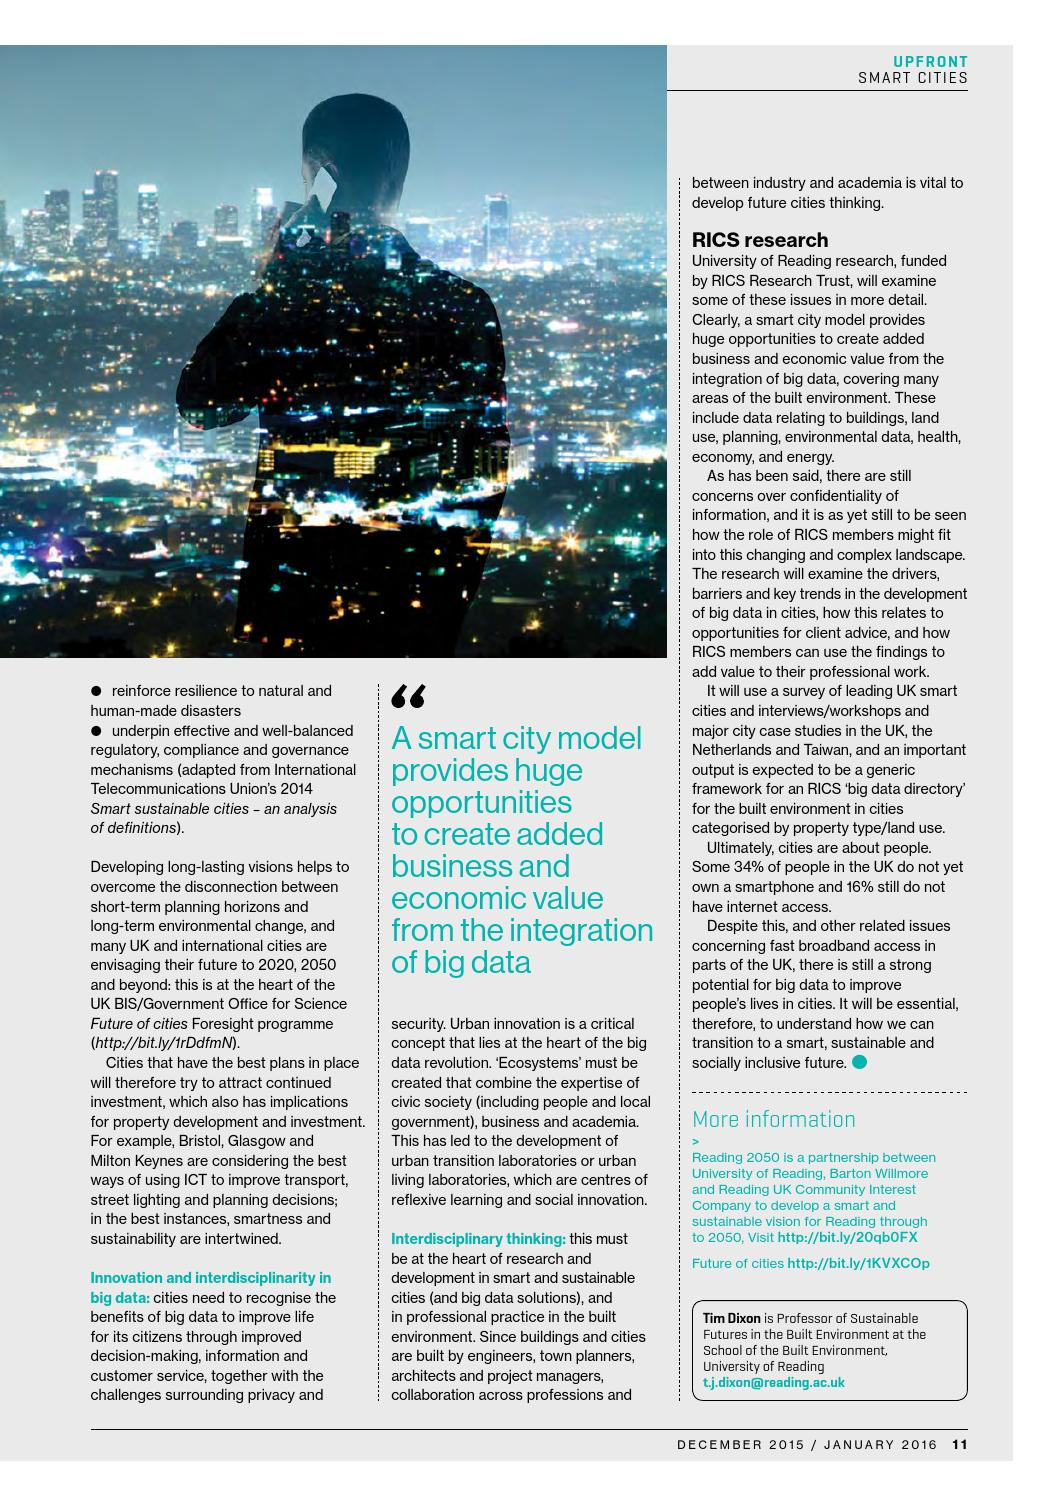 Property Journal December 2015-January 2016 by RICS - issuu